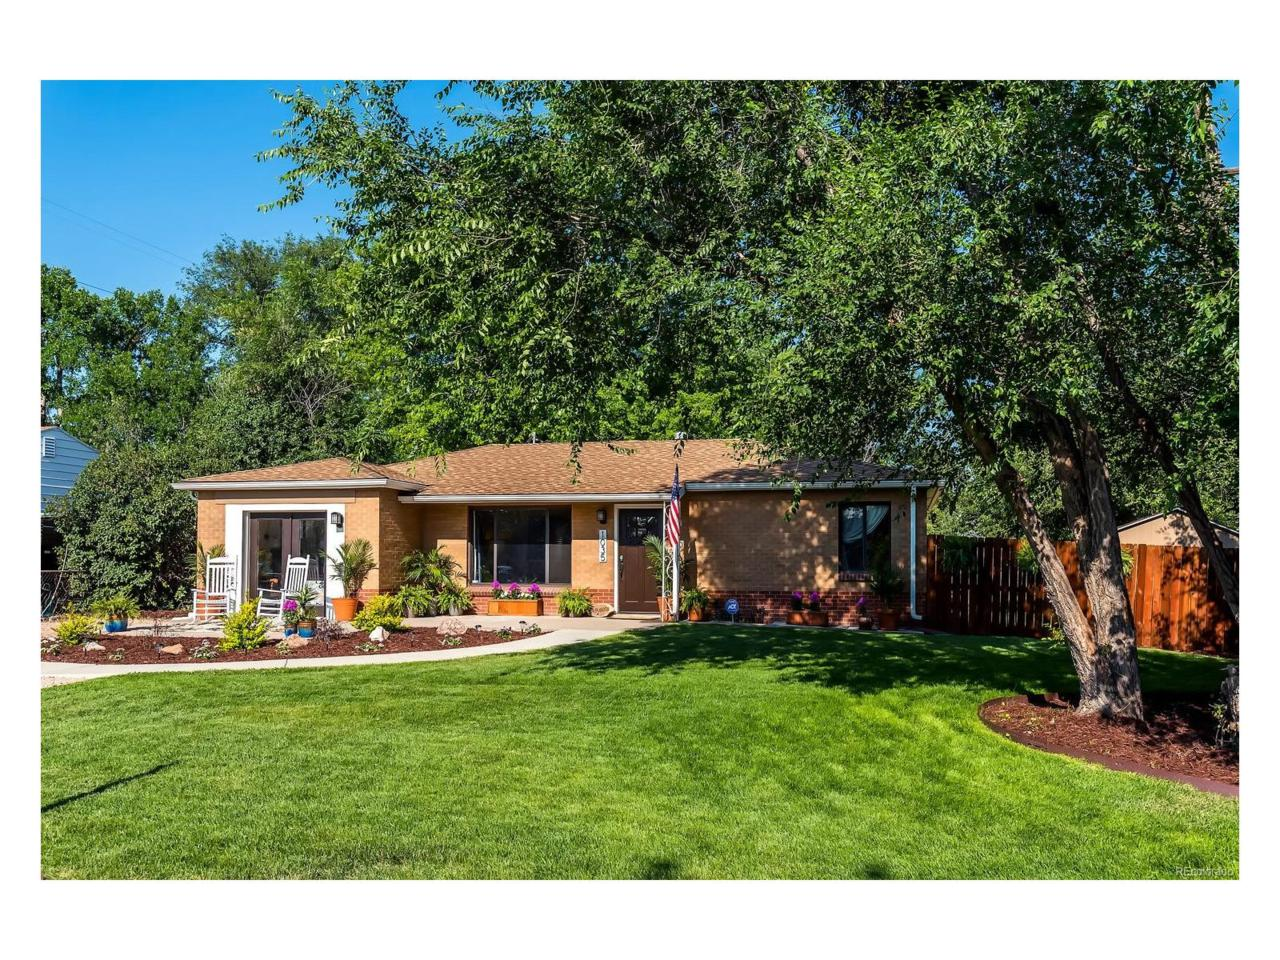 1035 Jay Street, Lakewood, CO 80214 (MLS #4365253) :: 8z Real Estate